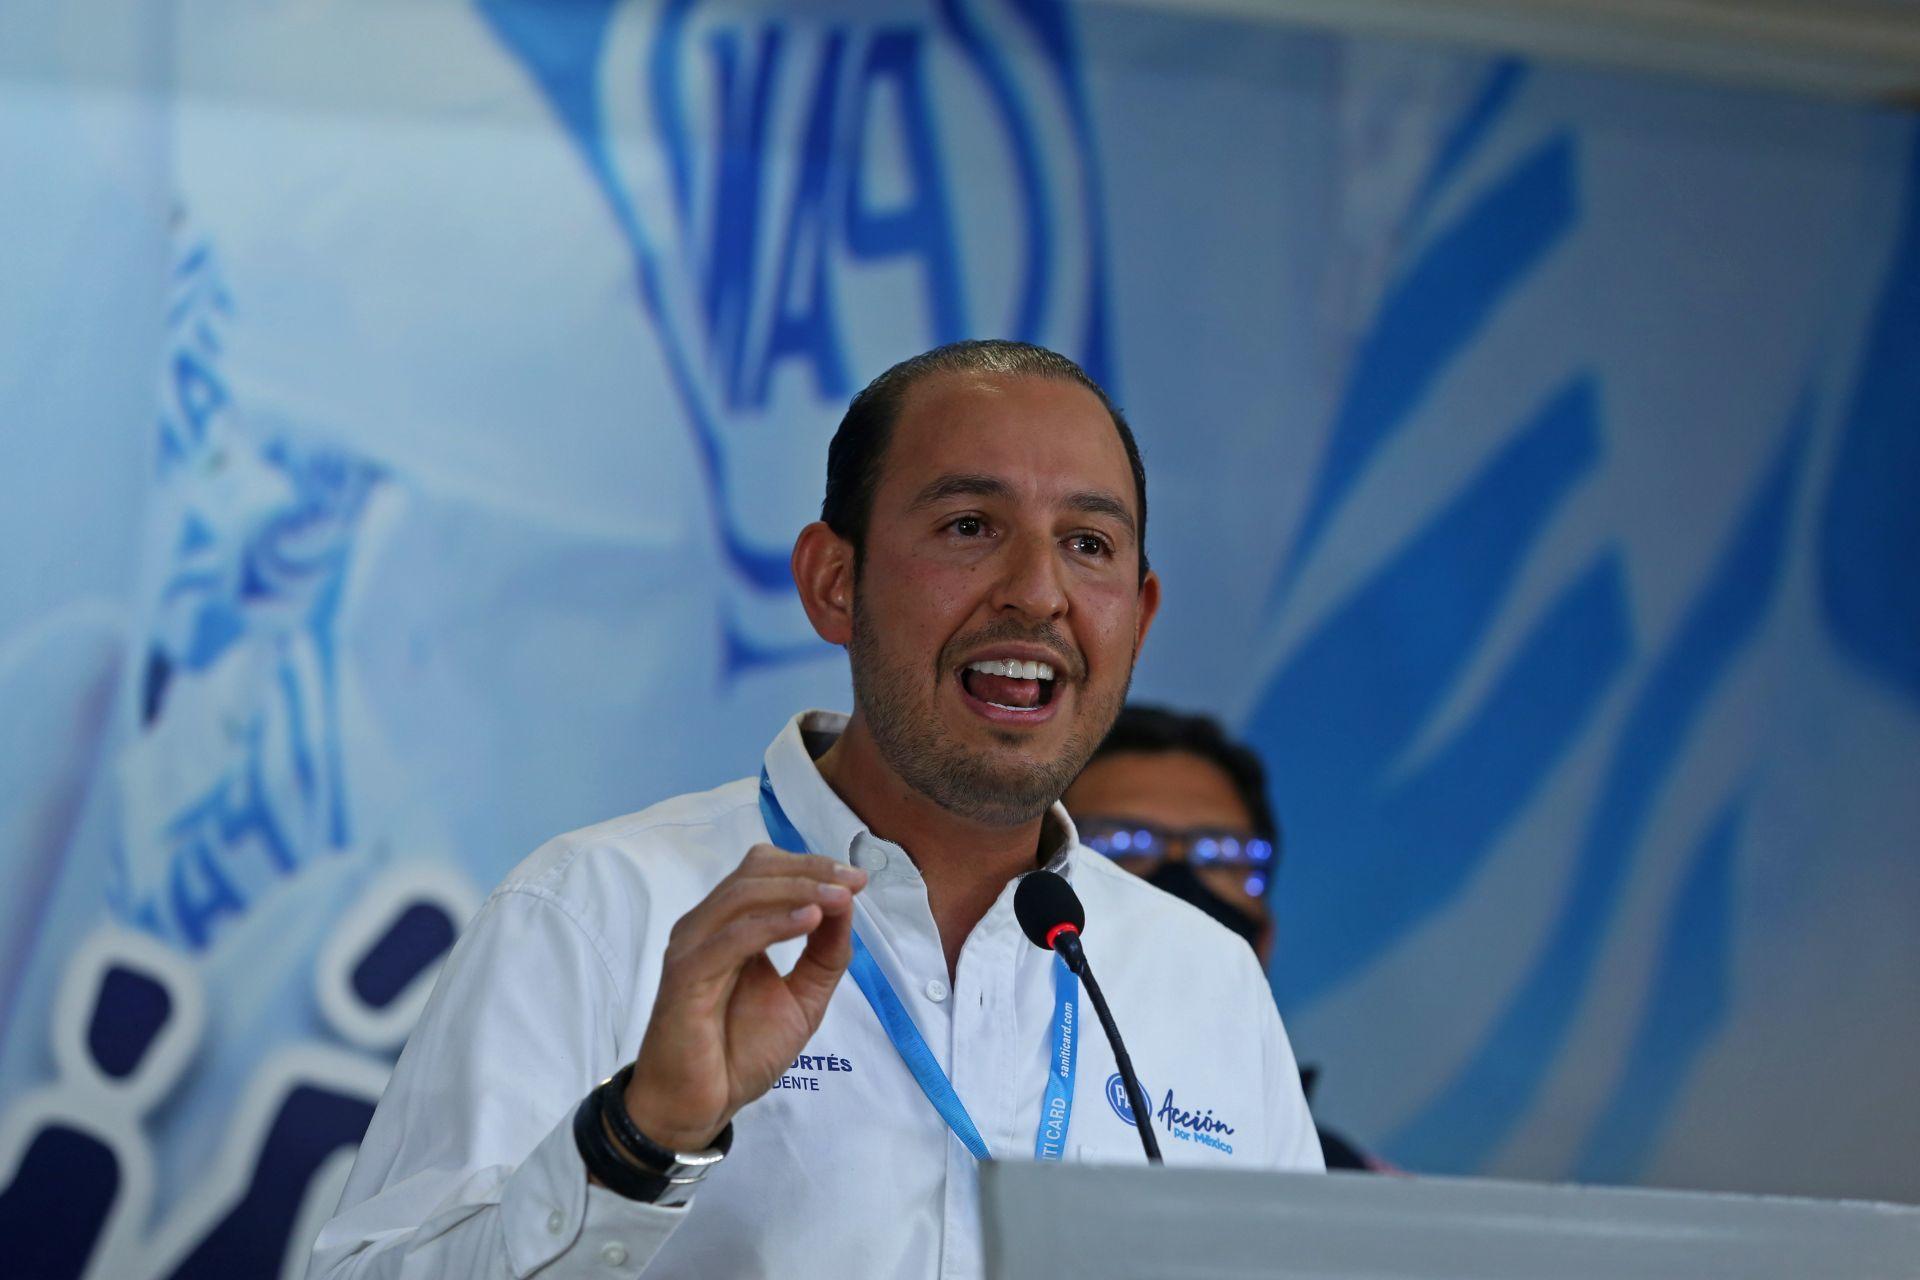 Asegura Marko Cortés que mexicanos esperan el triunfo del PAN